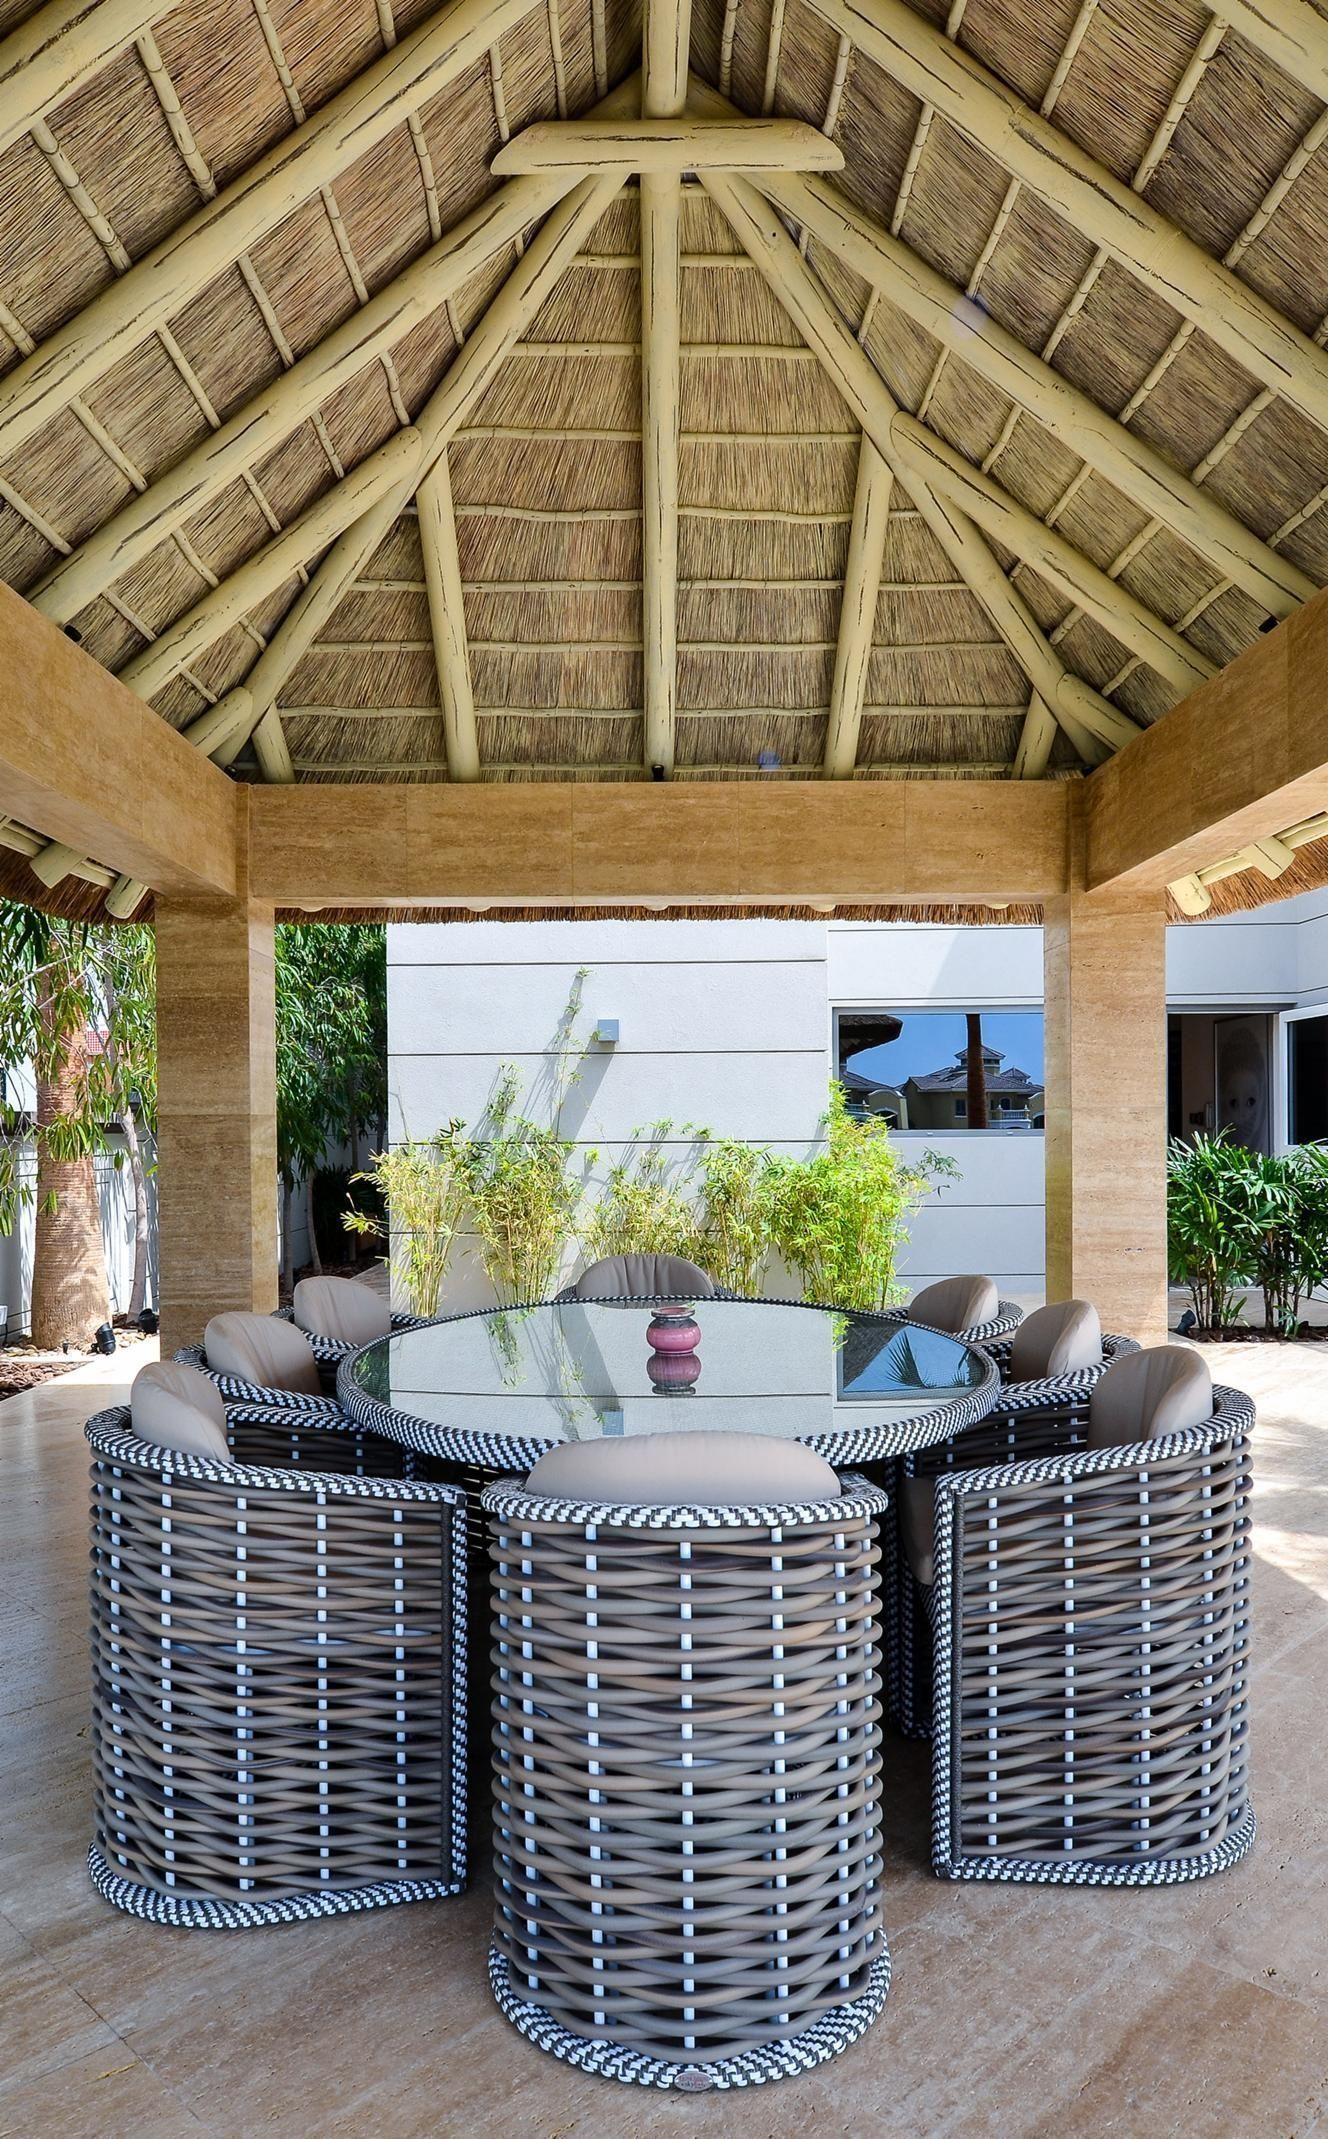 30 Beautiful Indoor And Outdoor Beach Dining Spaces Ideas To Copy Asap Gazebo Plans Deck Designs Backyard Outdoor Rooms Backyard modern lapa designs